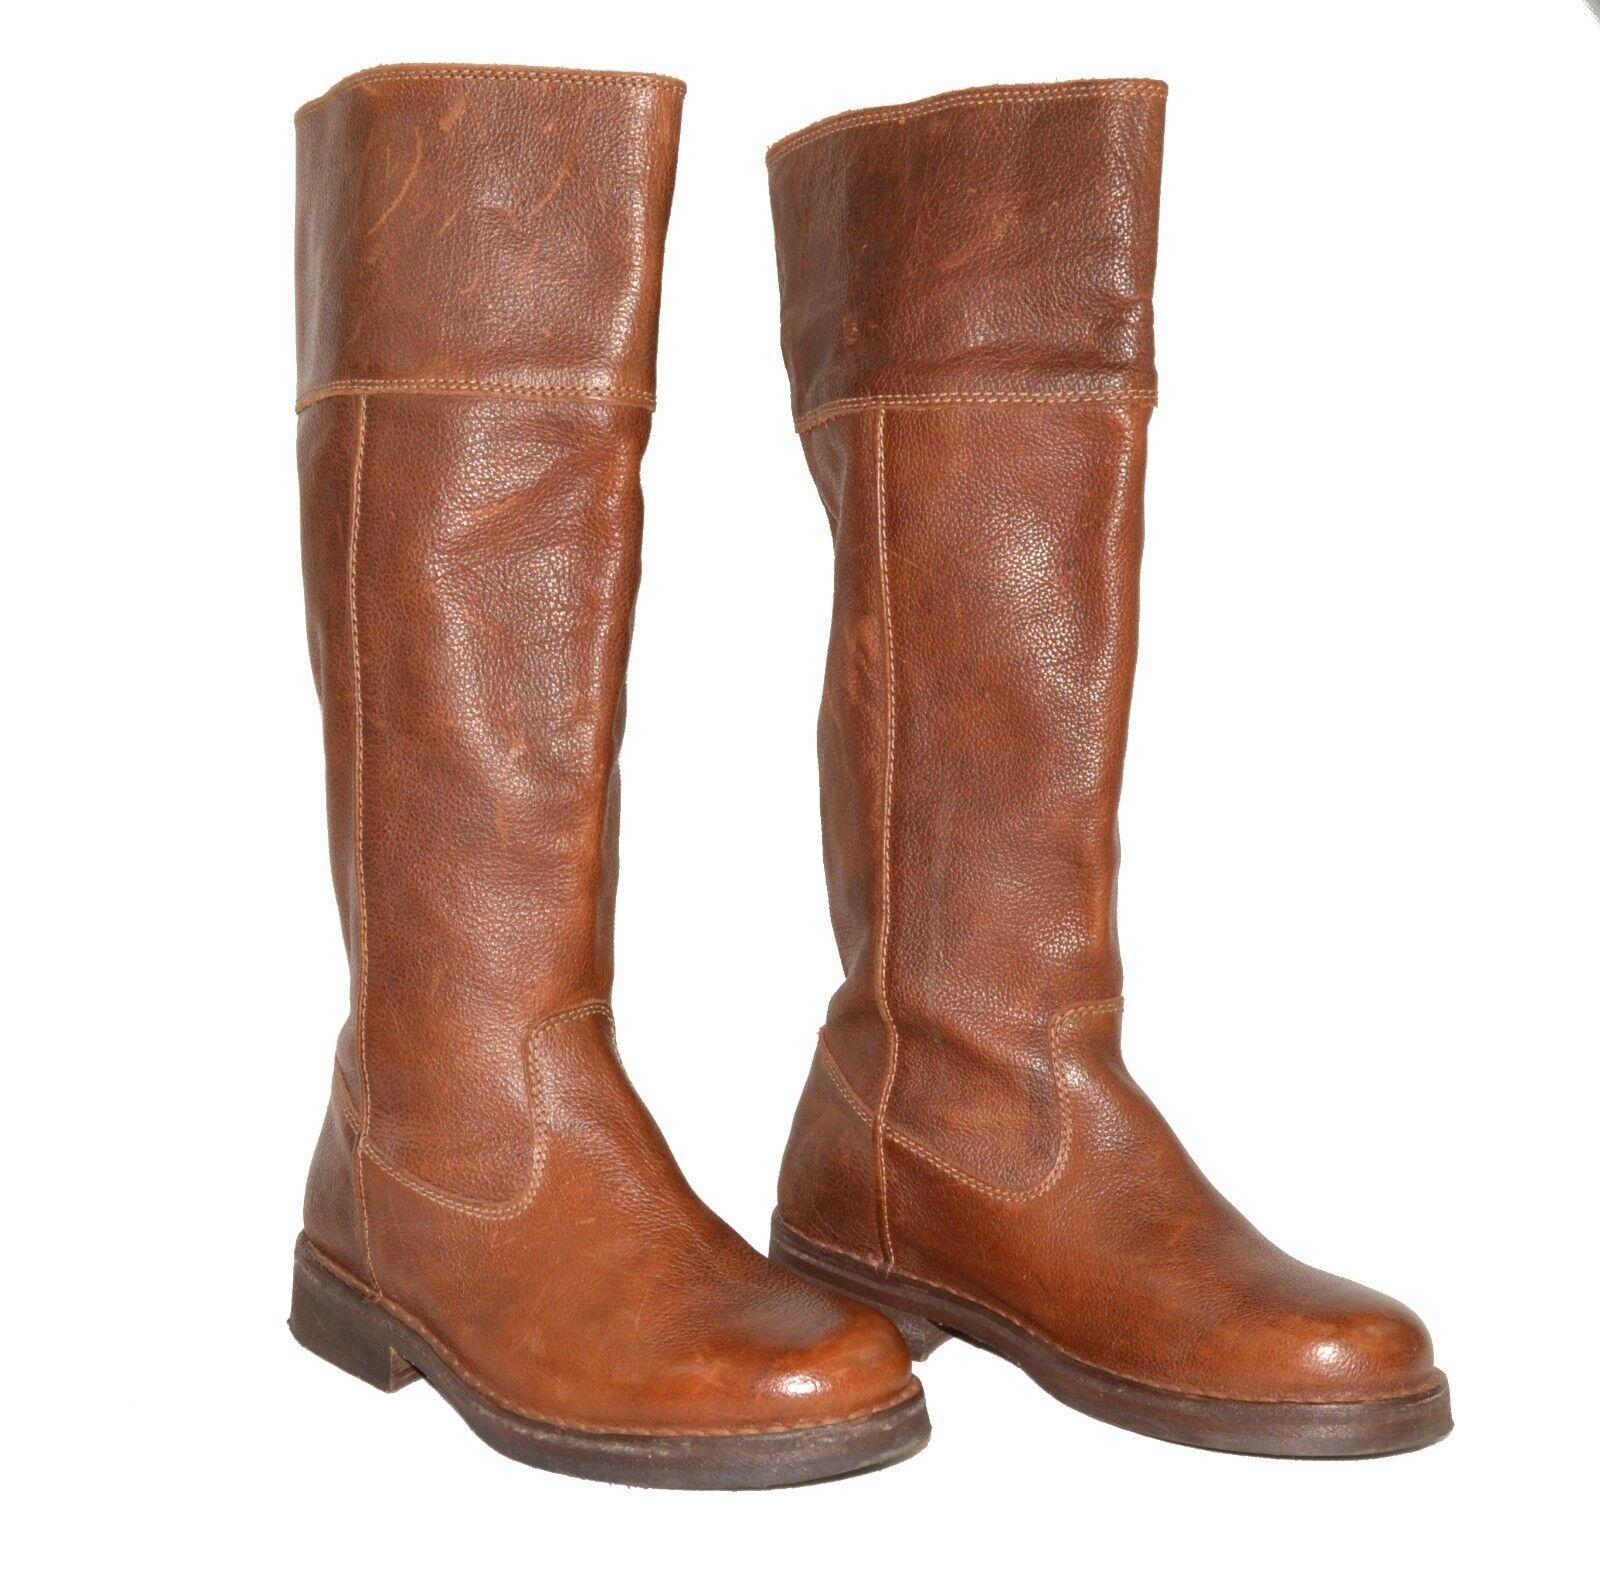 BODEN EU 5 36 UK 3 US 5 EU Dark Braun Distressed Leder Pull On Calf Length Stiefel a84597